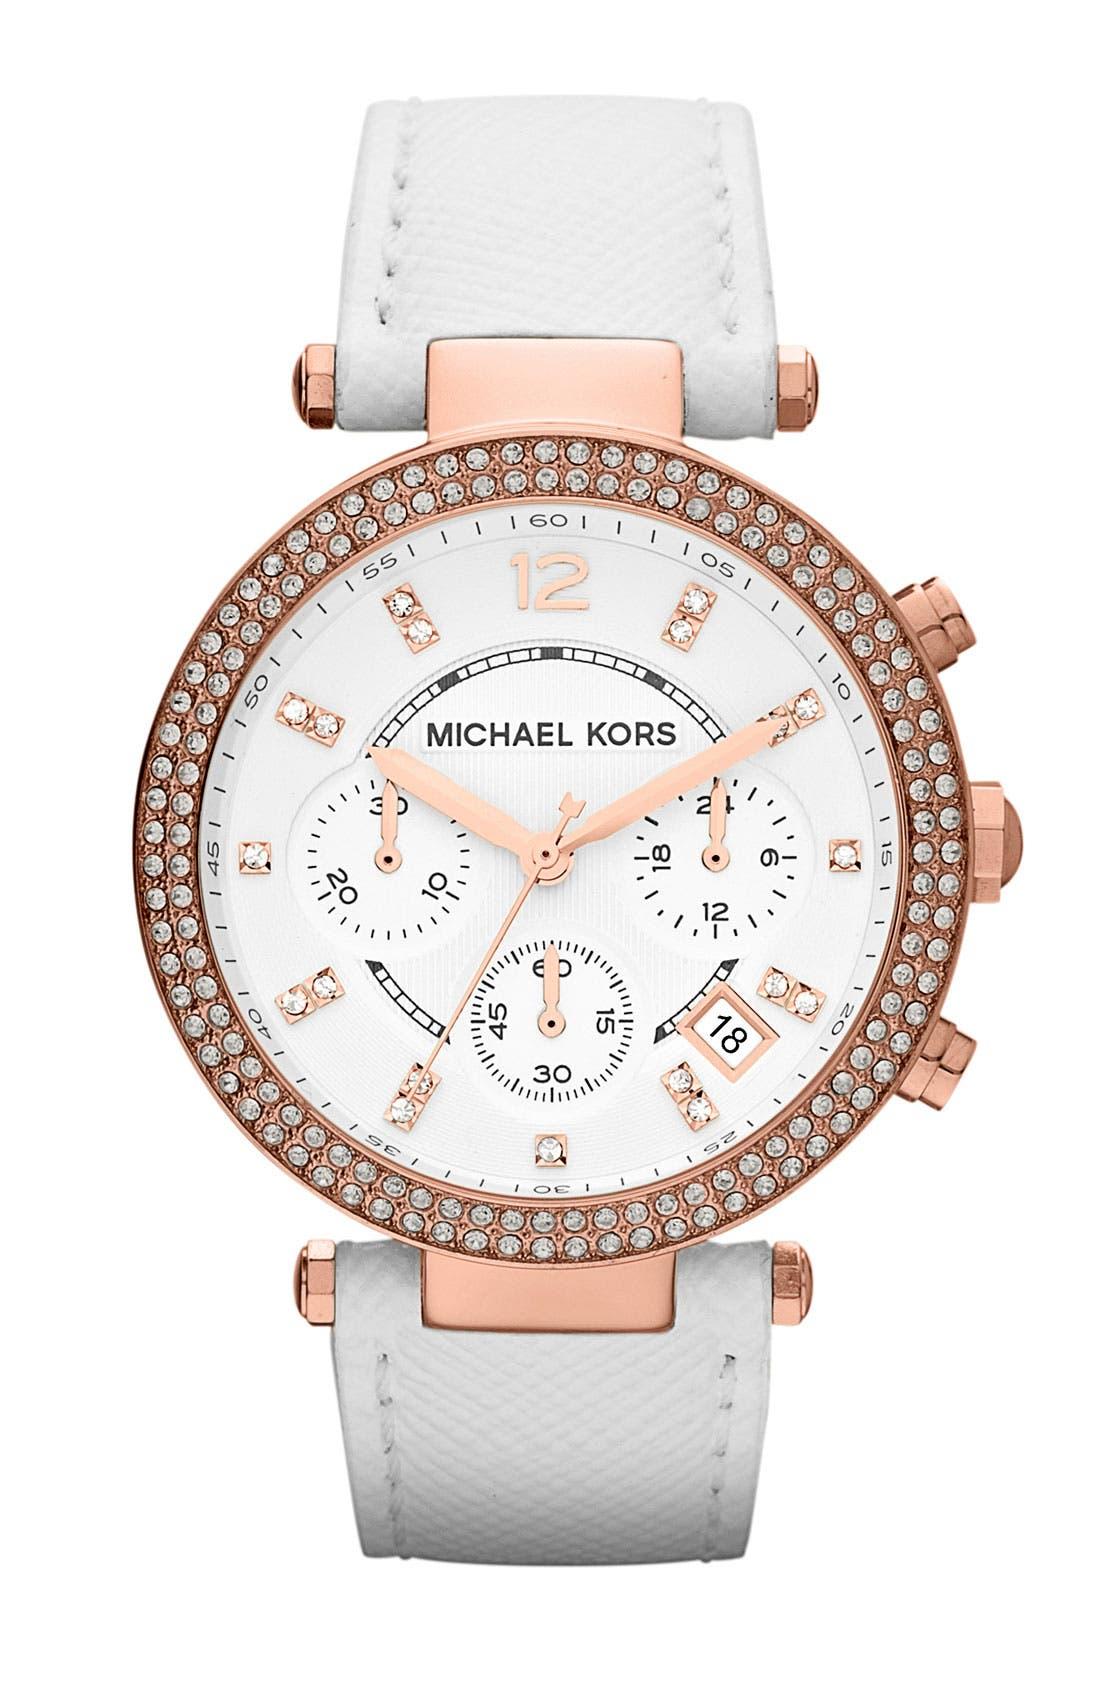 Michael Kors 'Parker' Chronograph Leather Watch, 39mm,                         Main,                         color, 100